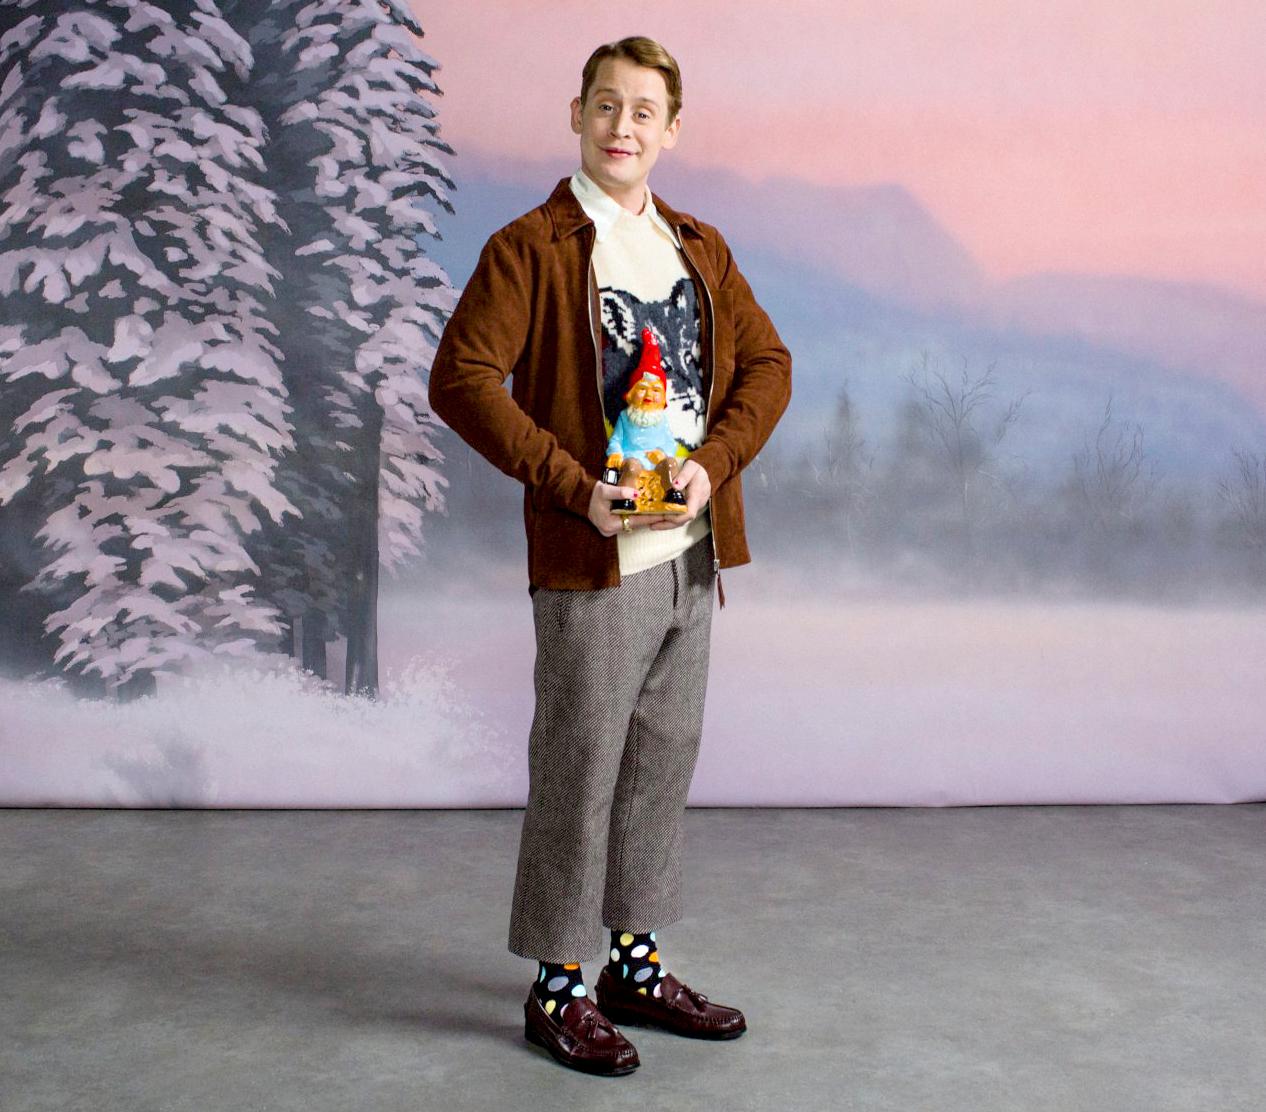 Macaulay-Culkin-Happy-Socks